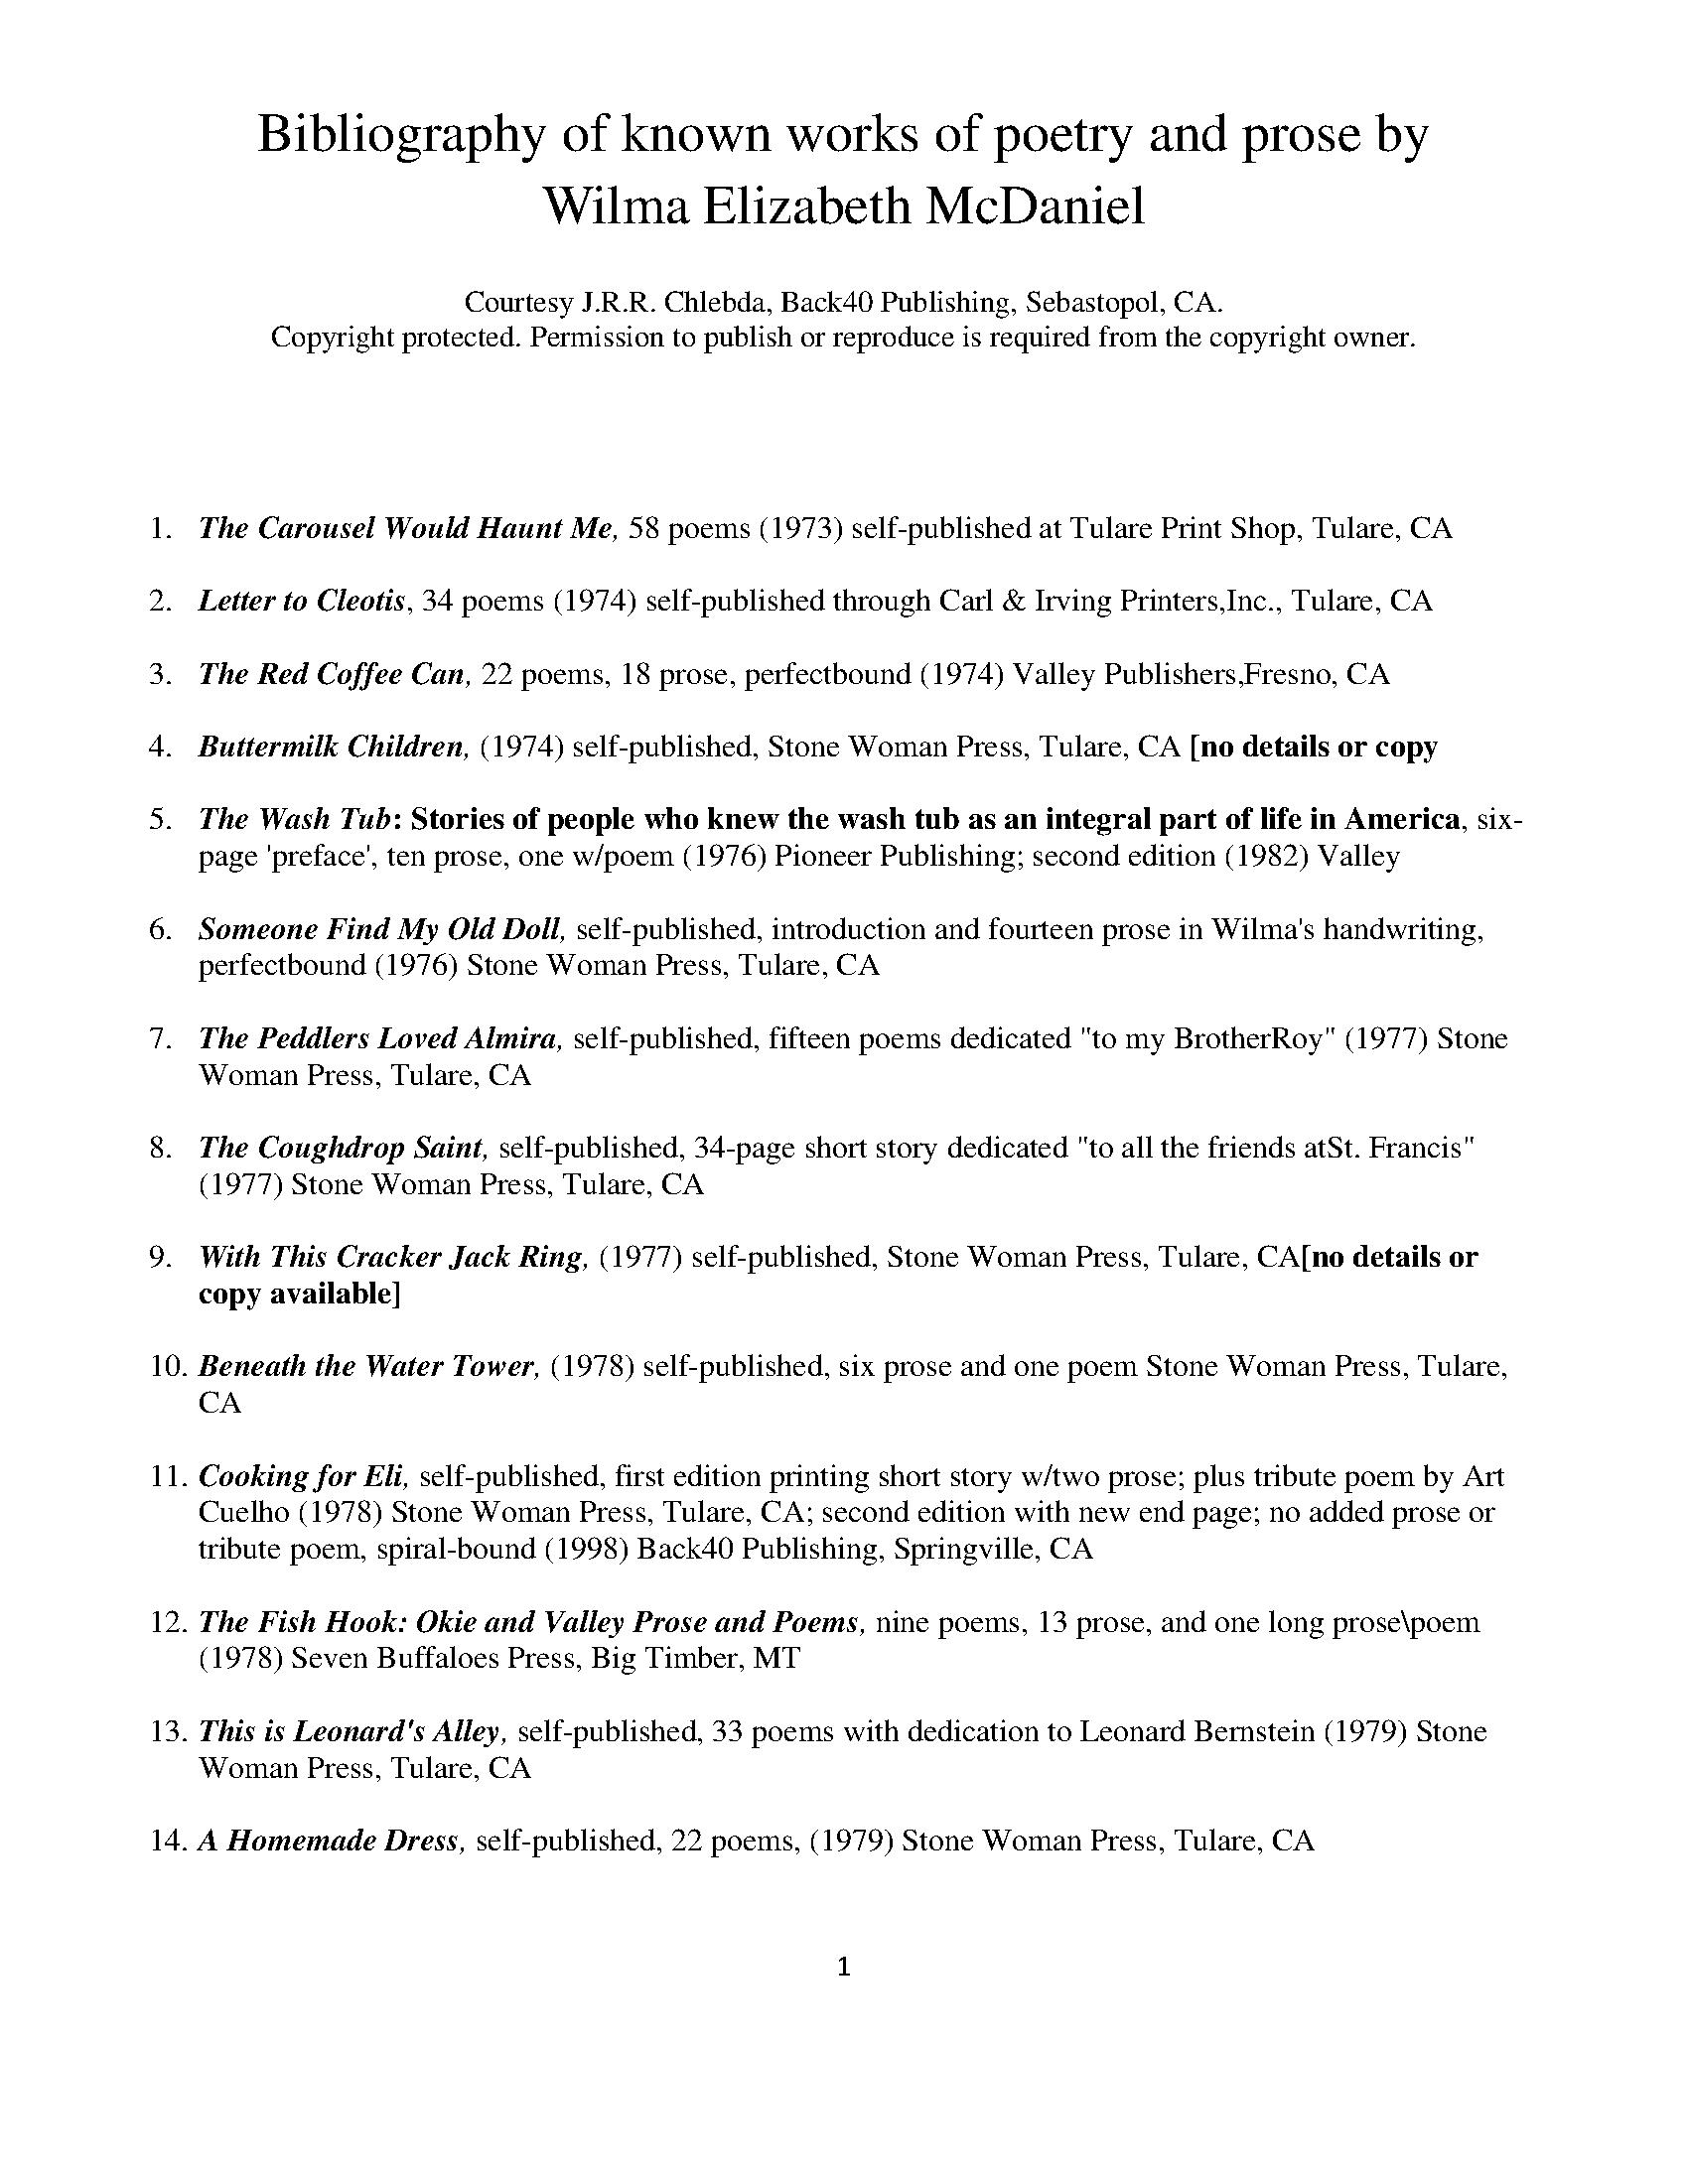 Bibliography of Known Works by Wilma Elizabeth McDaniel - Page 1